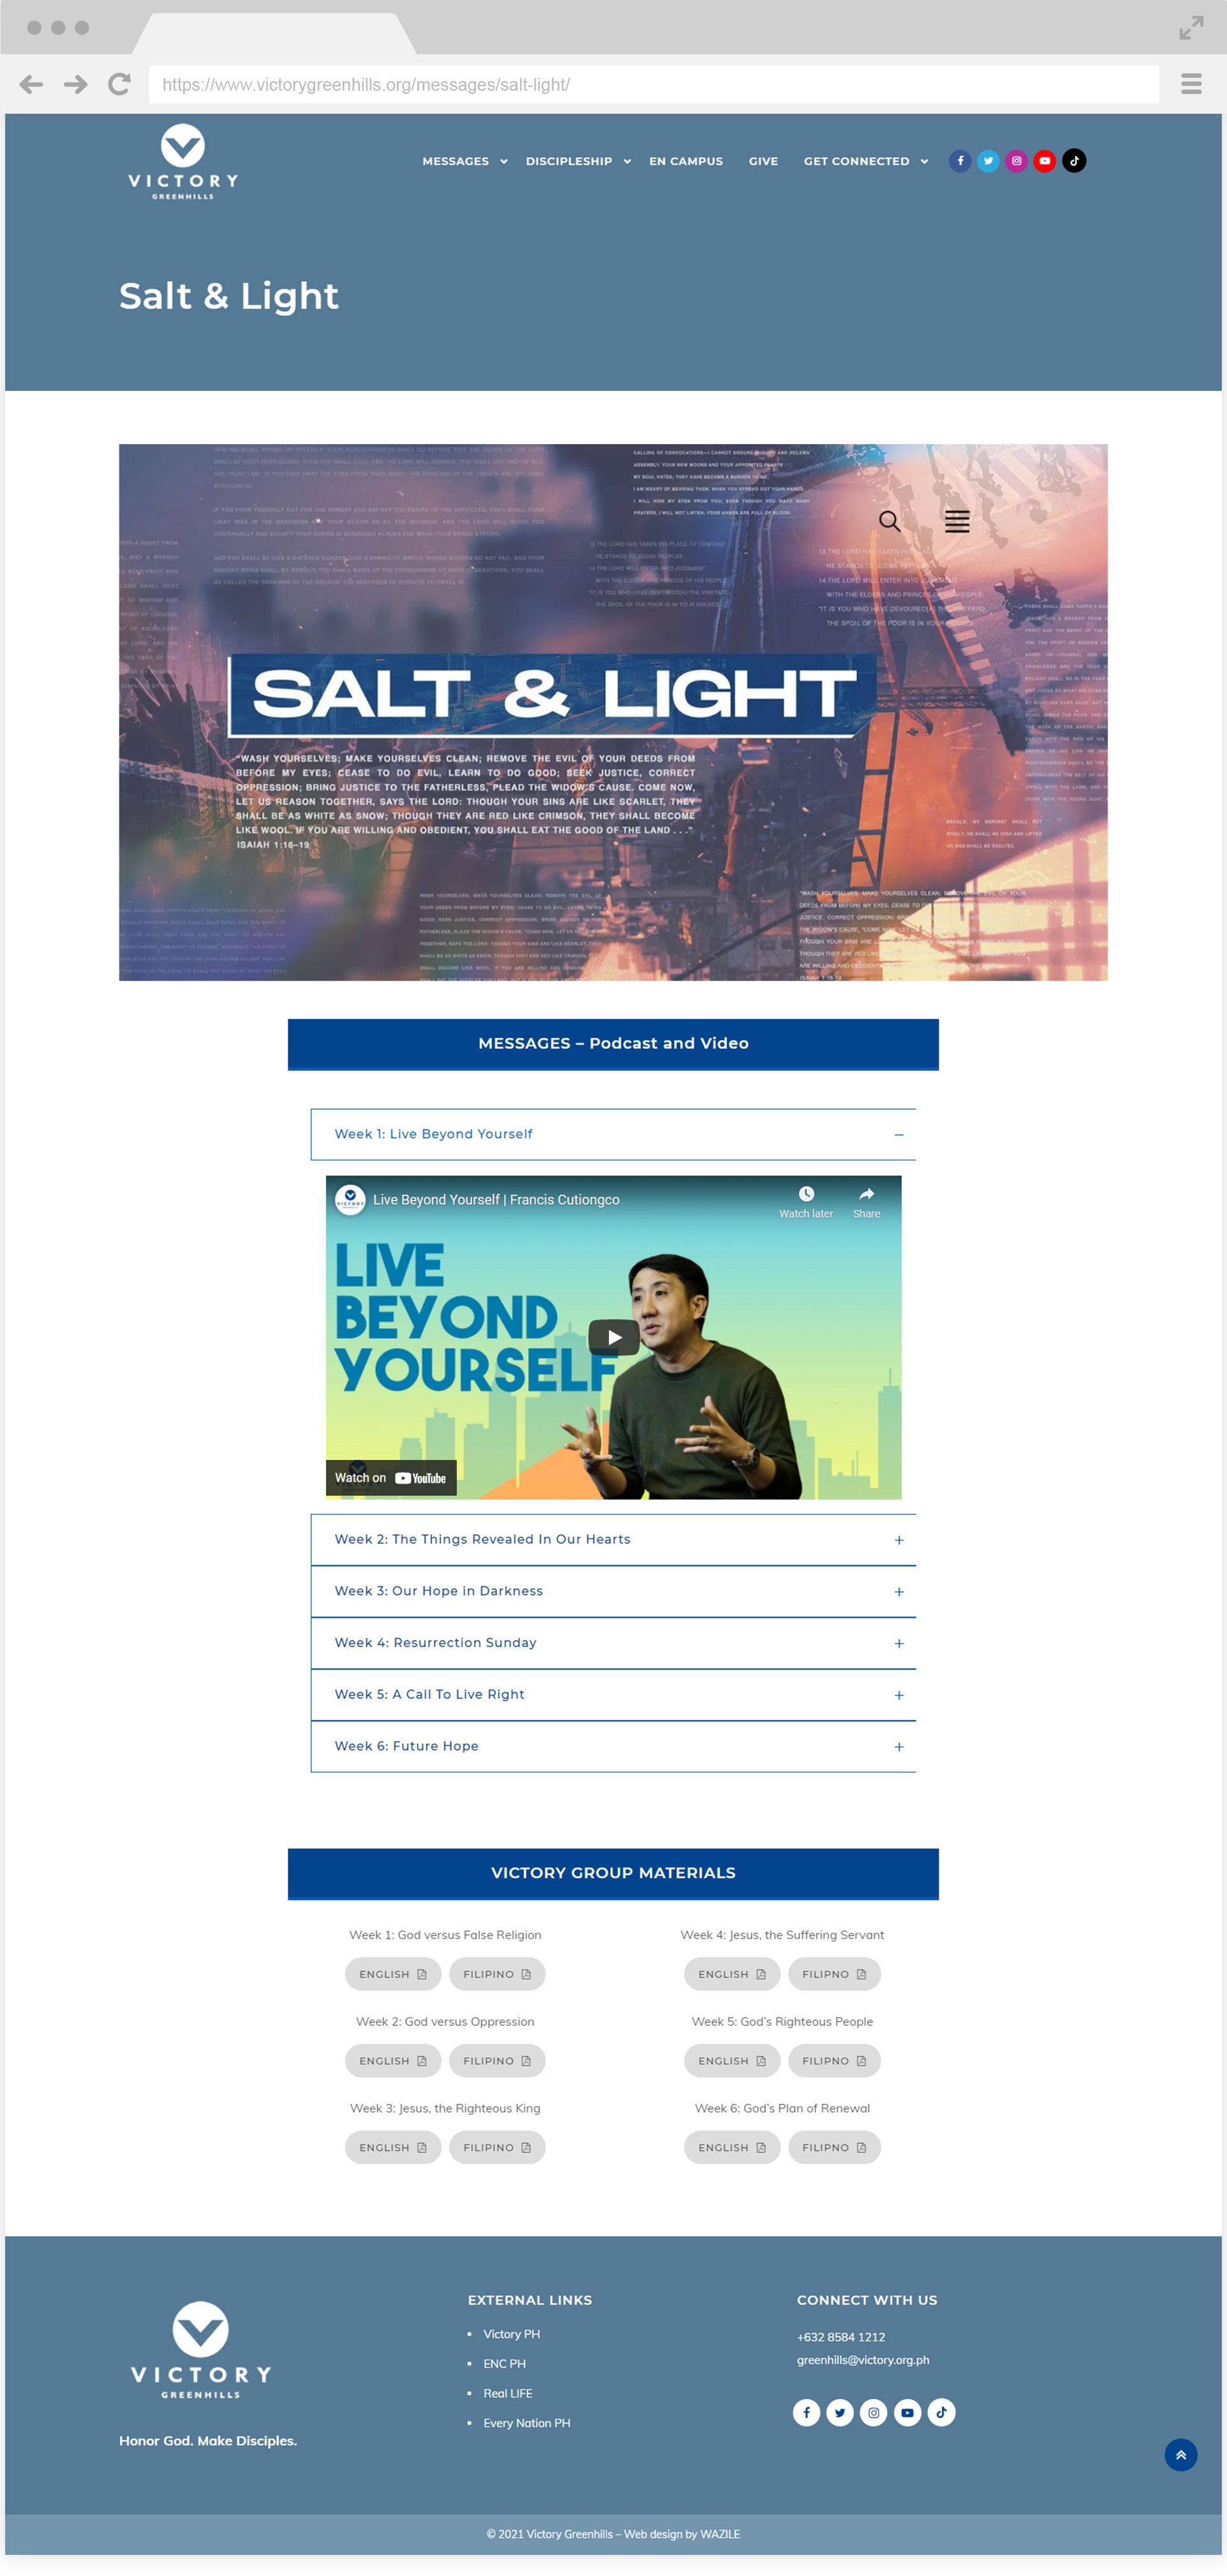 Victory Greenhills Salt & Light